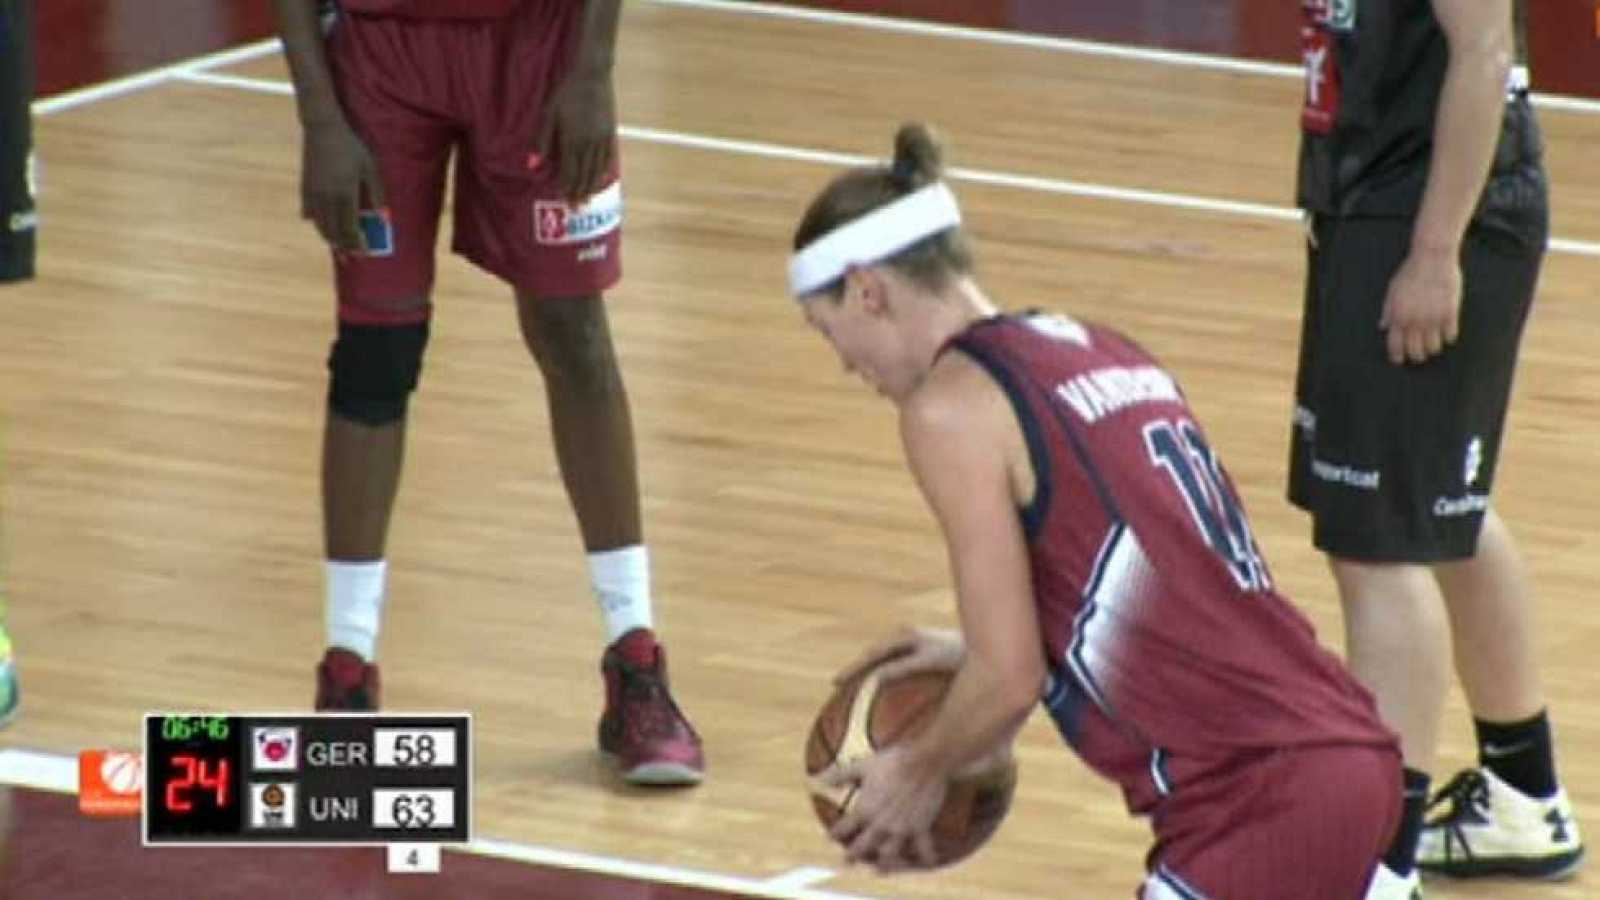 Baloncesto - Liga española femenina. 7ª jornada: Gernika Bizkaia - SPAR Citylift Girona ¿ ver ahora